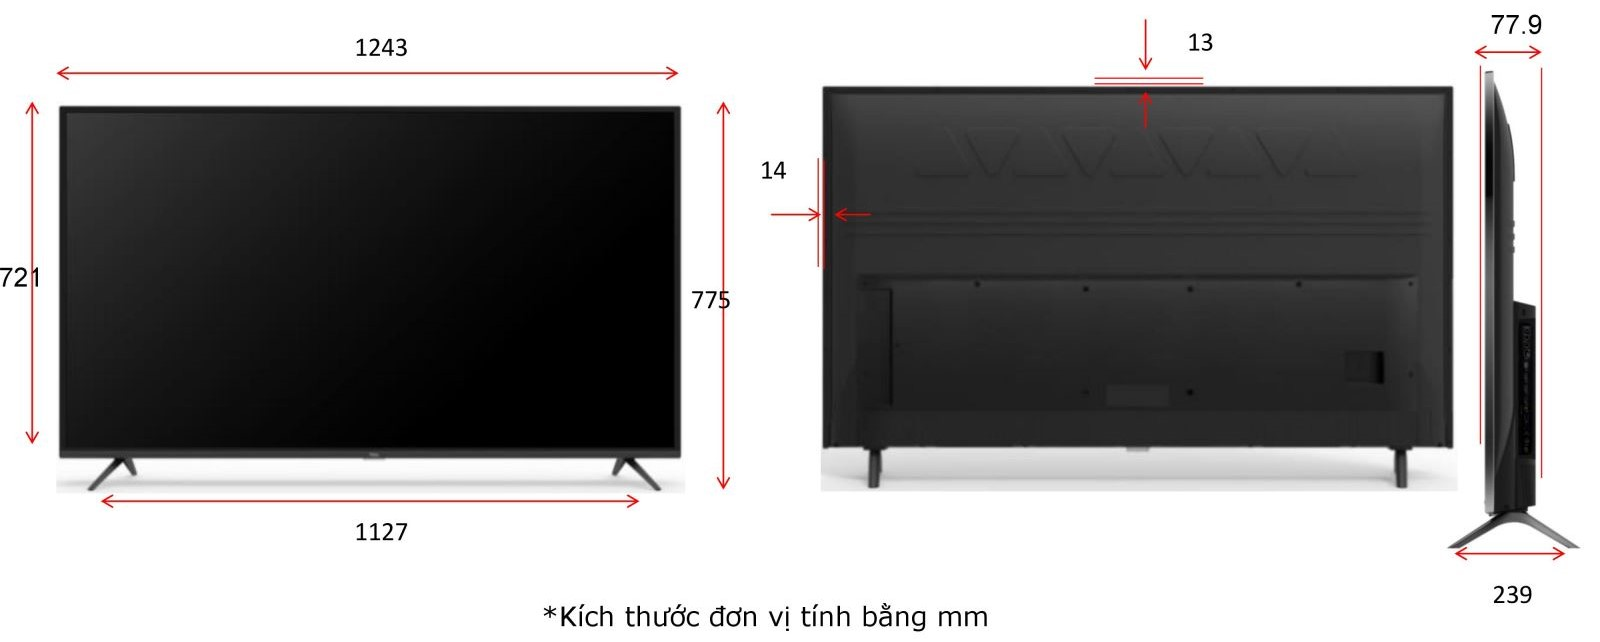 Smart Tivi TCL 55 inch UHD 4K - Model 55P65